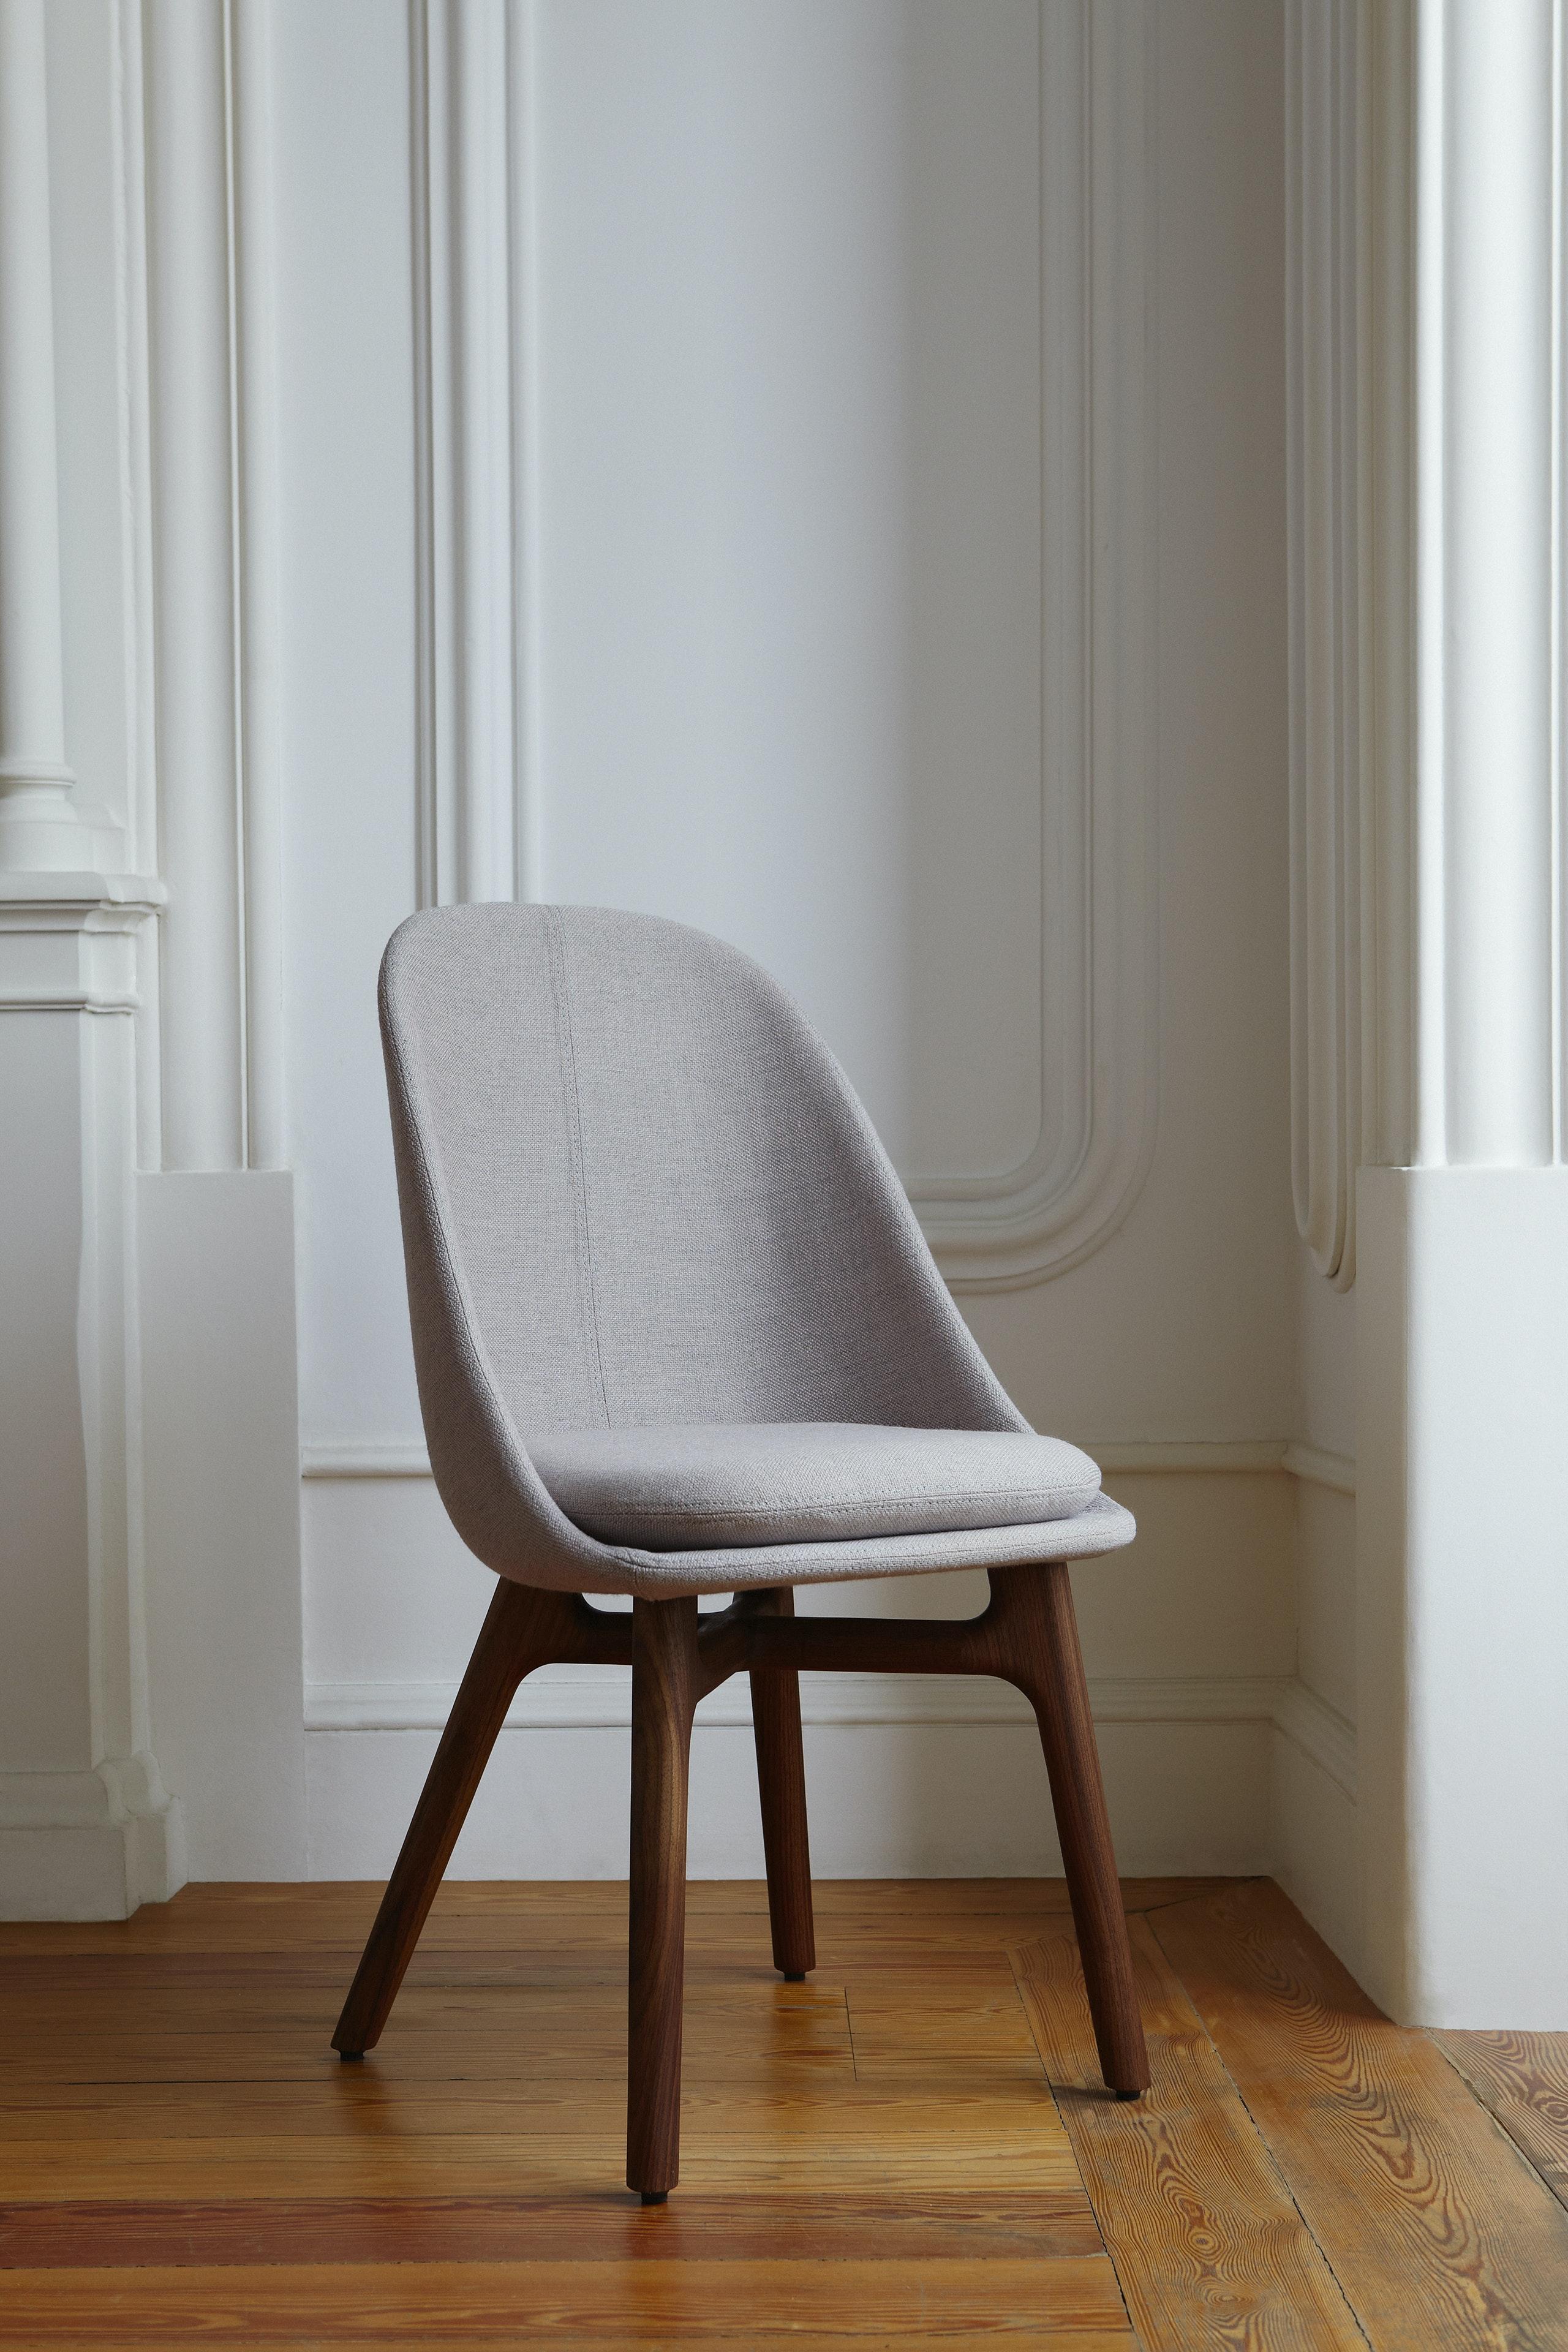 Solo Dining Chair By Neri Hu Photo By Yuki Sugiura